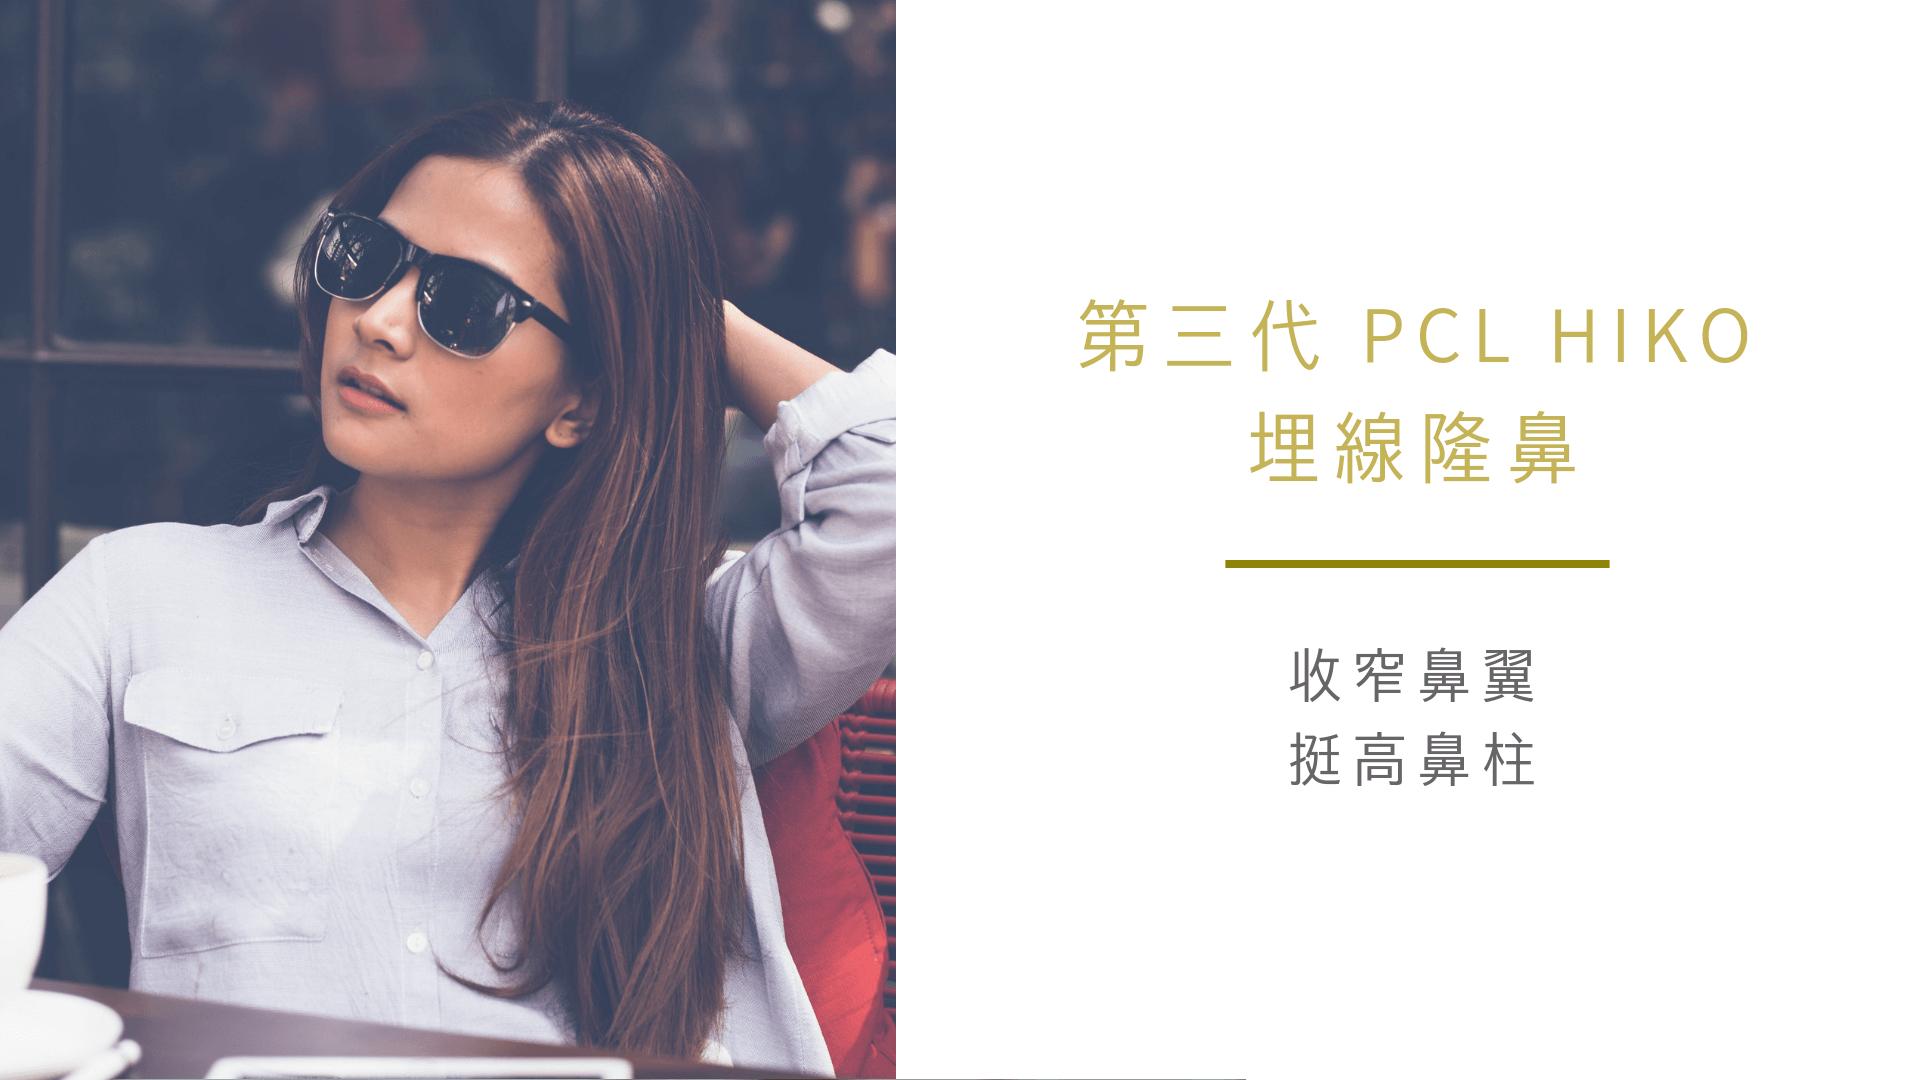 PCL Hiko 第三代埋線隆鼻